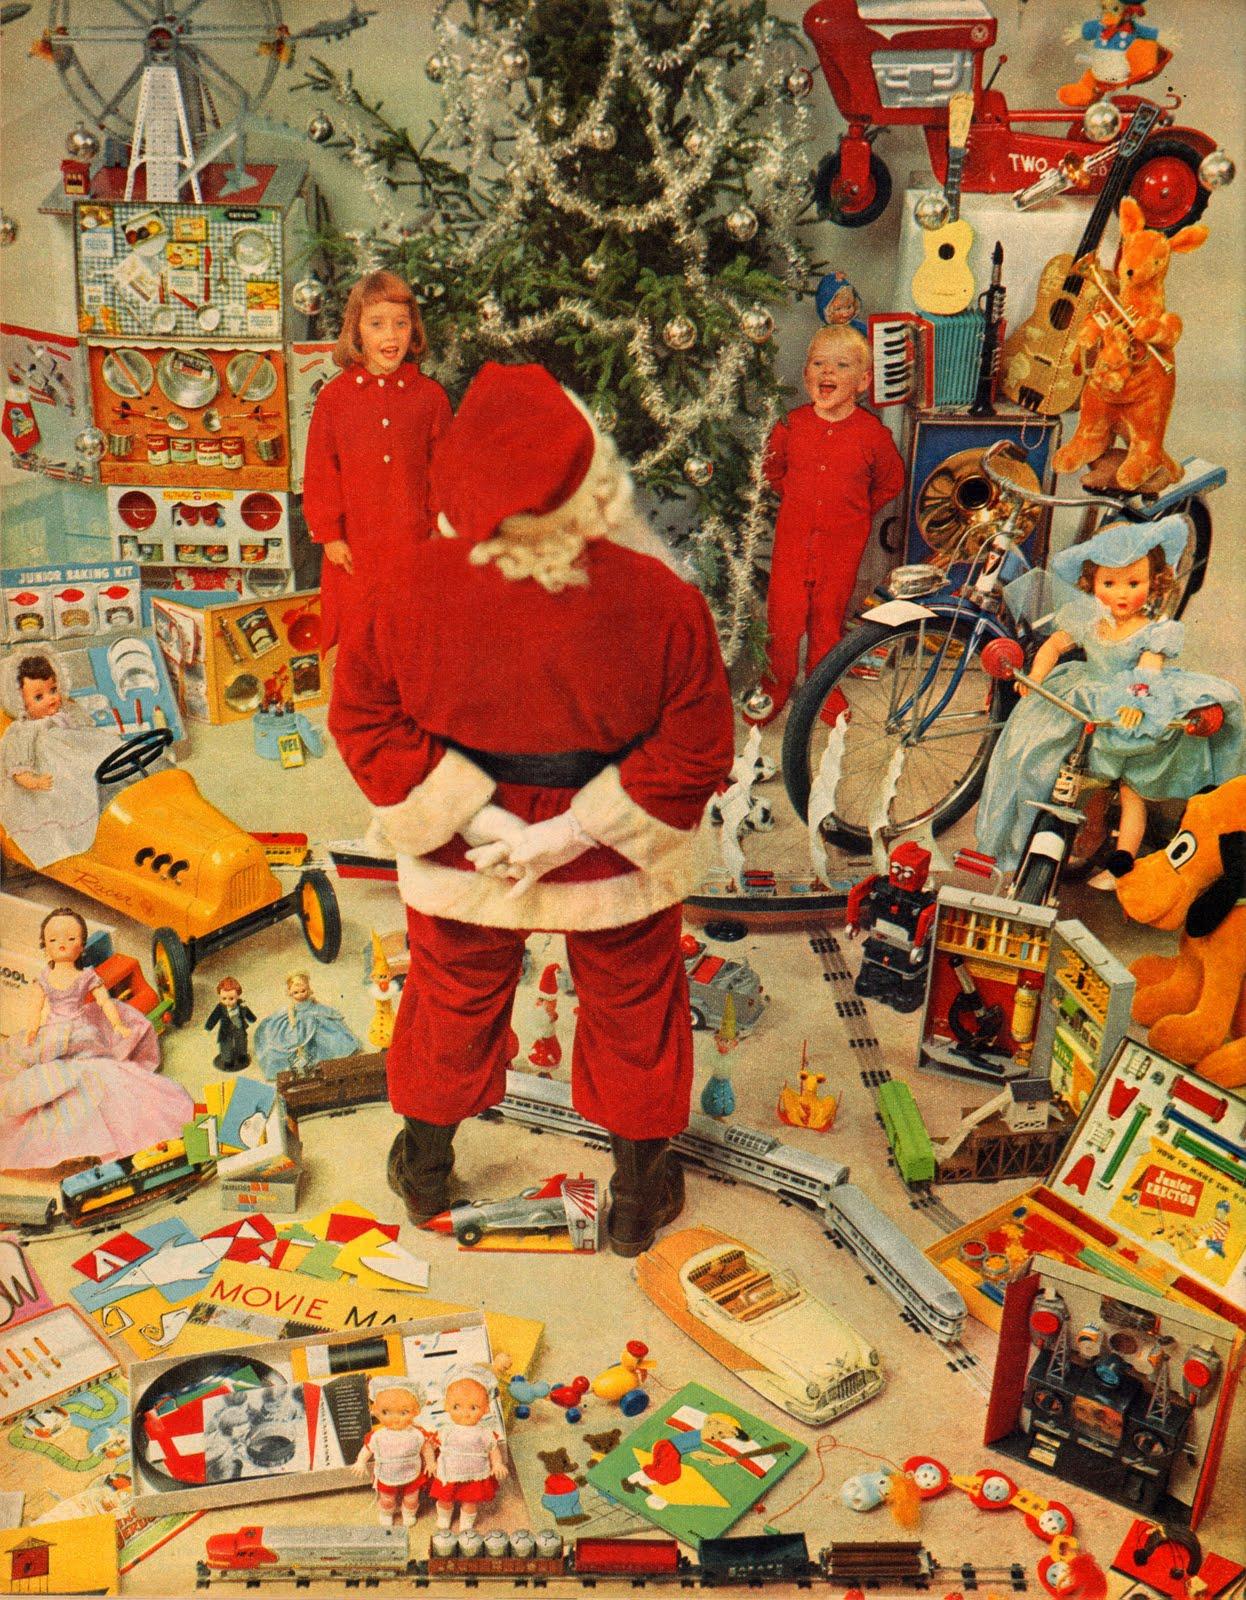 Retro Christmas Toy : Neat stuff christmas presents